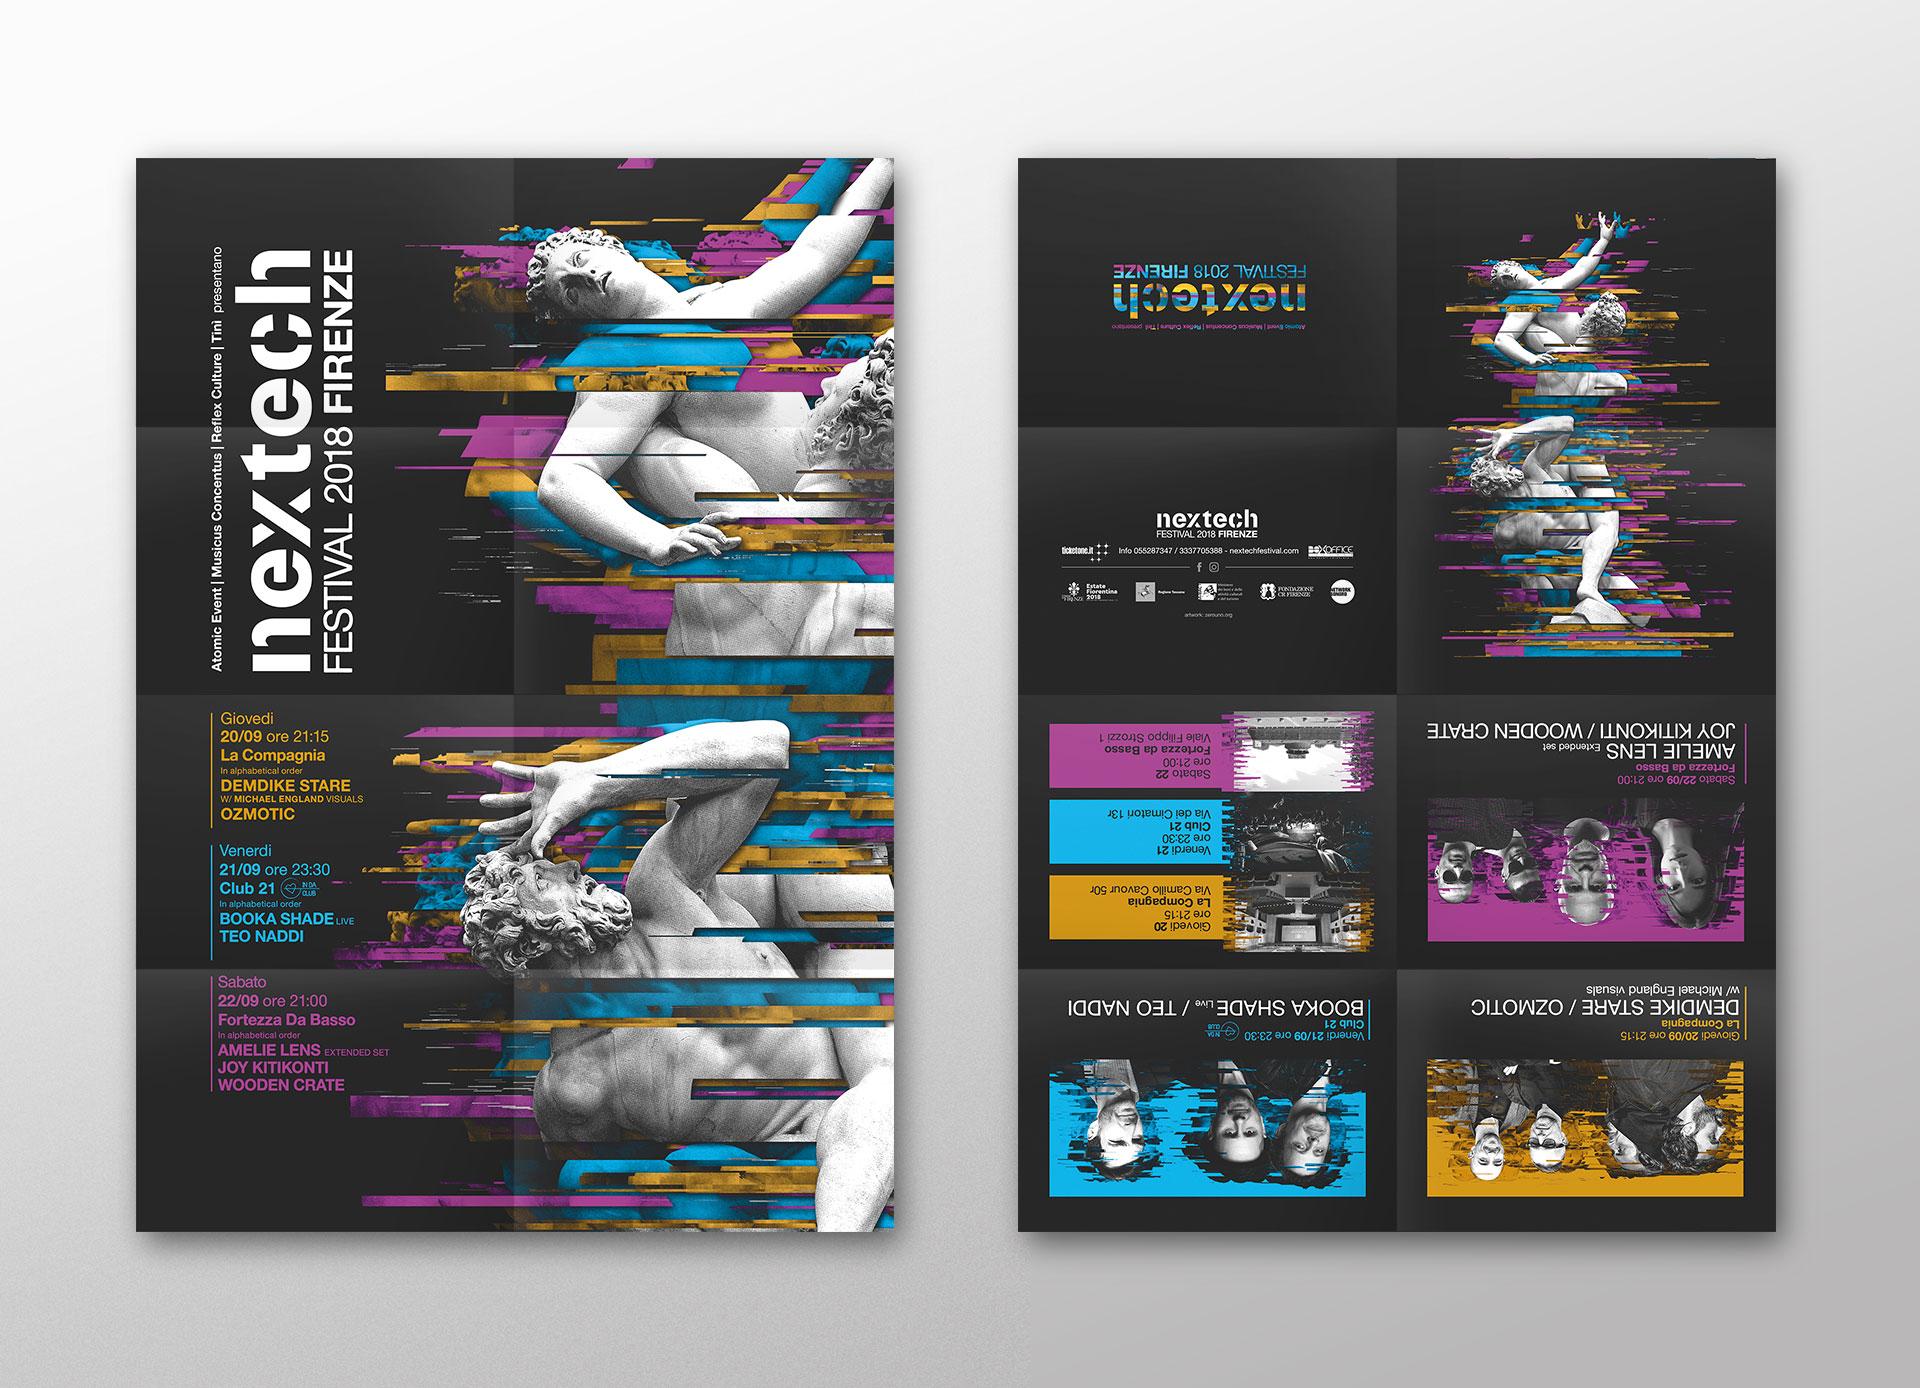 nextech-festival-2018-folding-flyer-zerouno-design